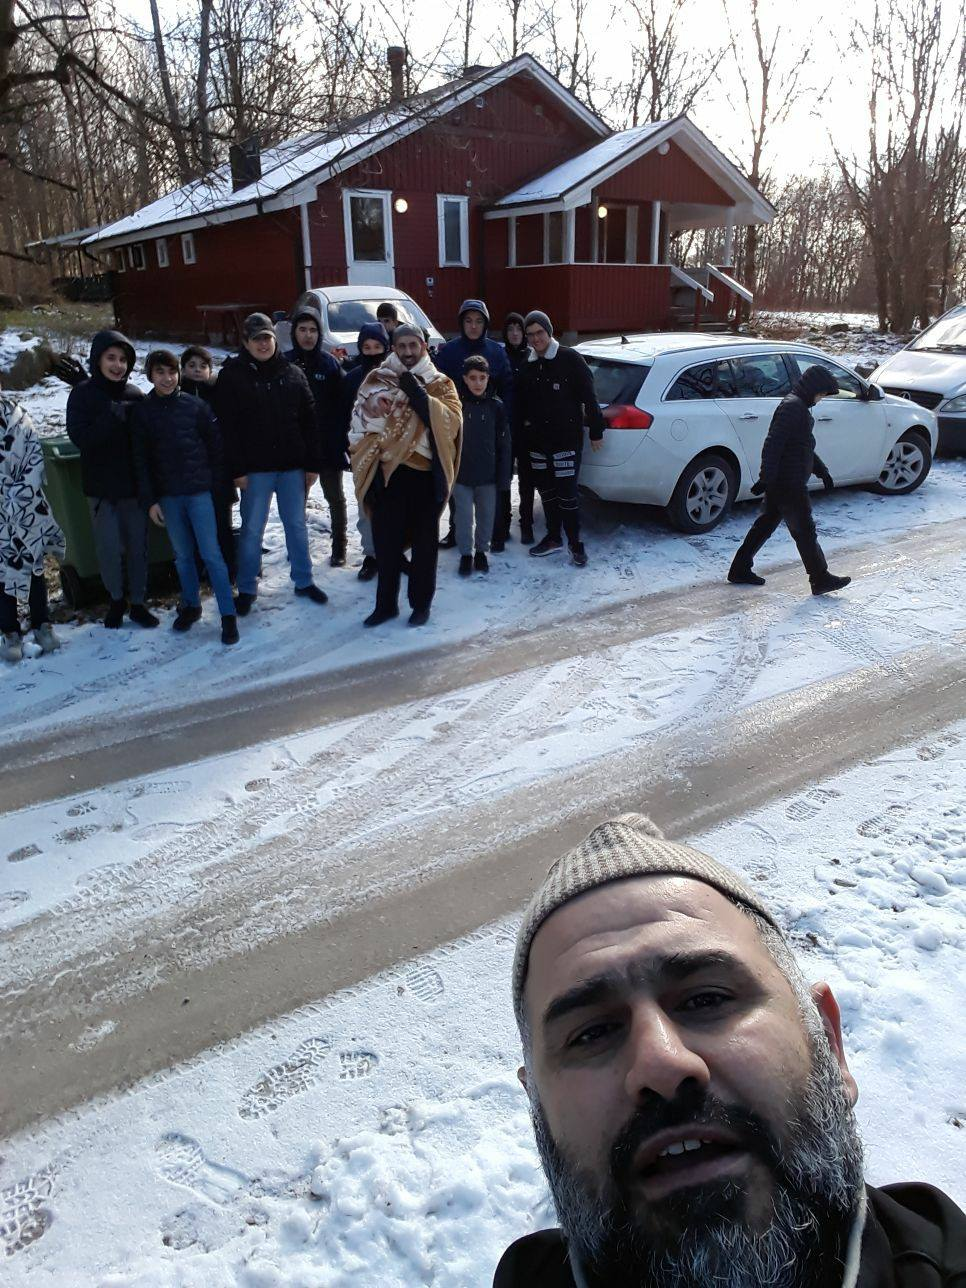 Vandretur i Jularp, Sverige